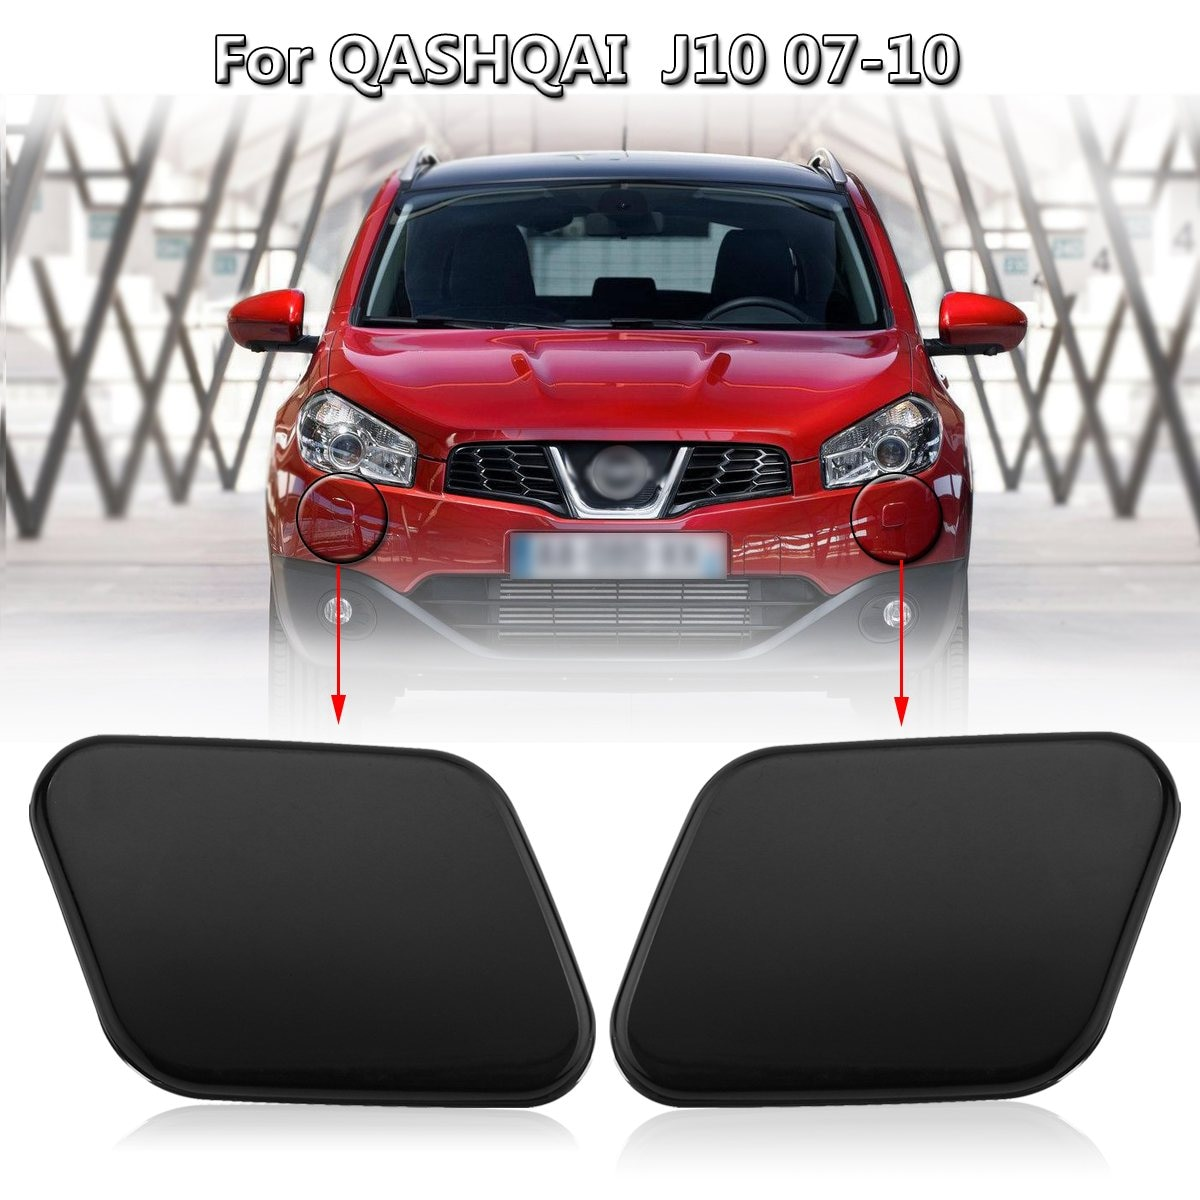 Автомойка для передних и правых фар, Форсунка для Nissan Qashqai J10 2007-2010